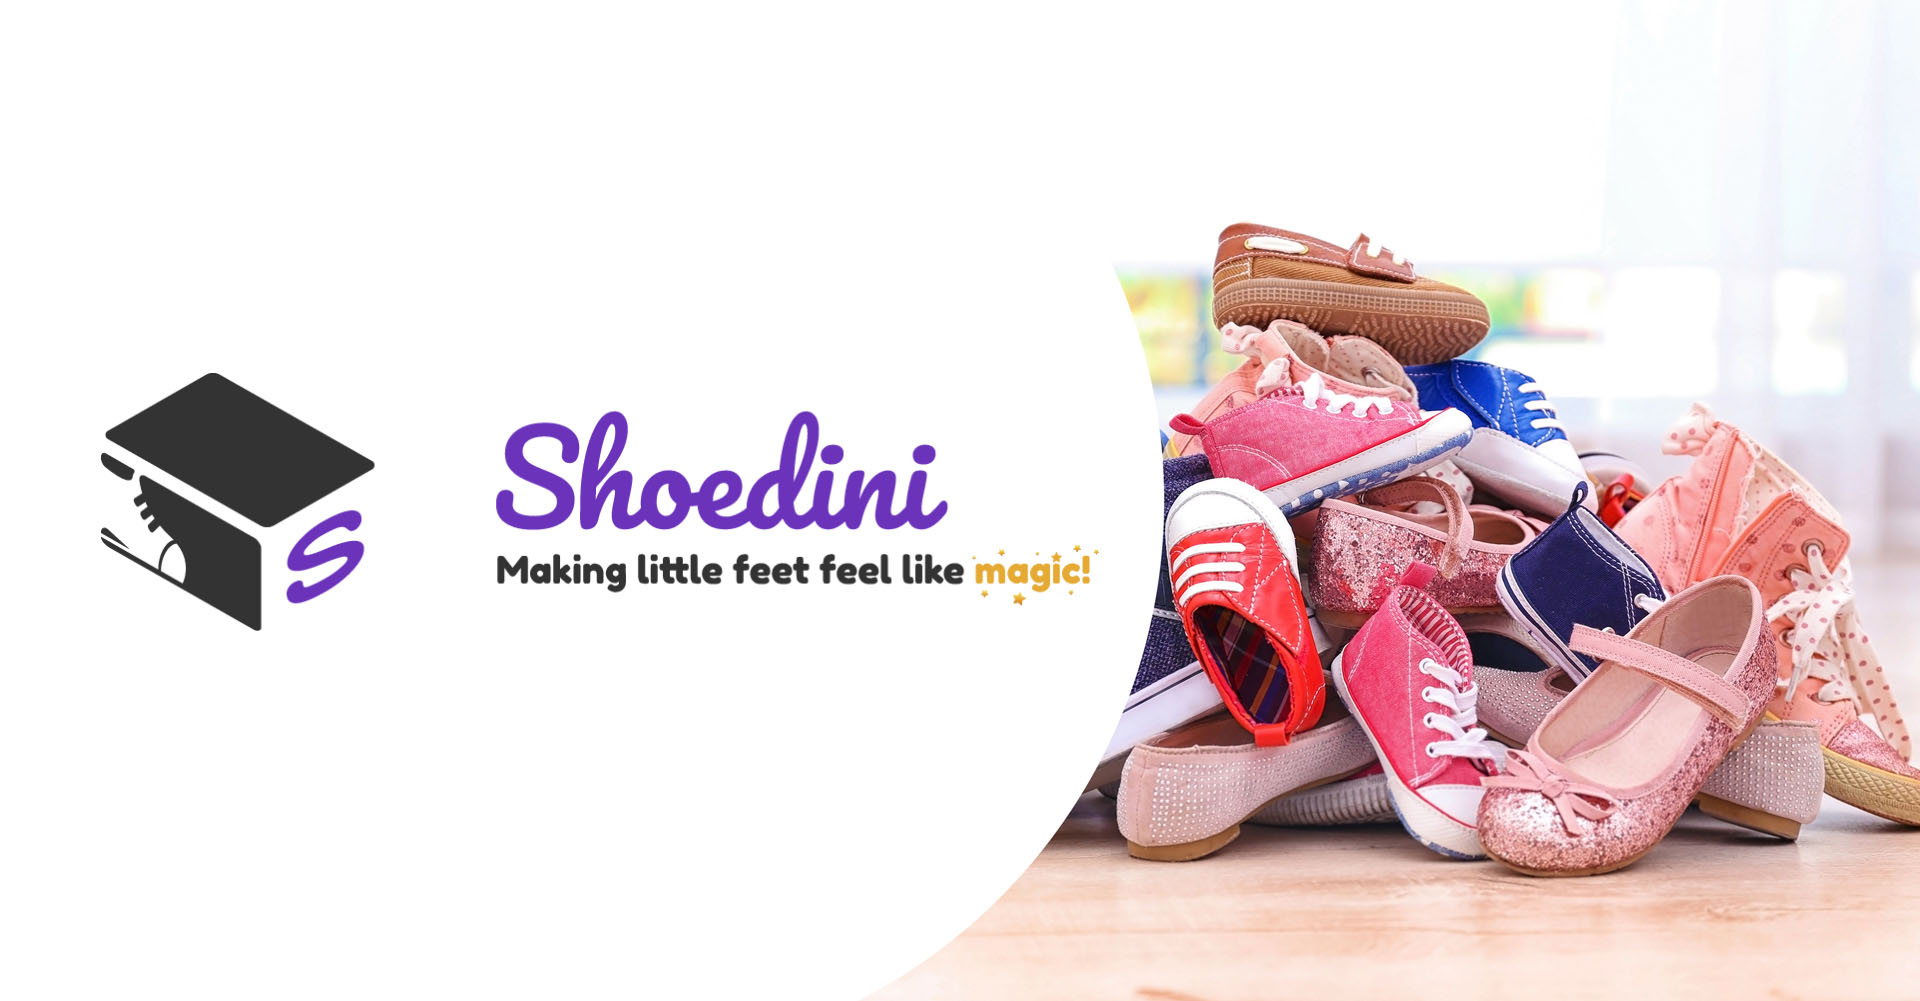 Shoedini's main image